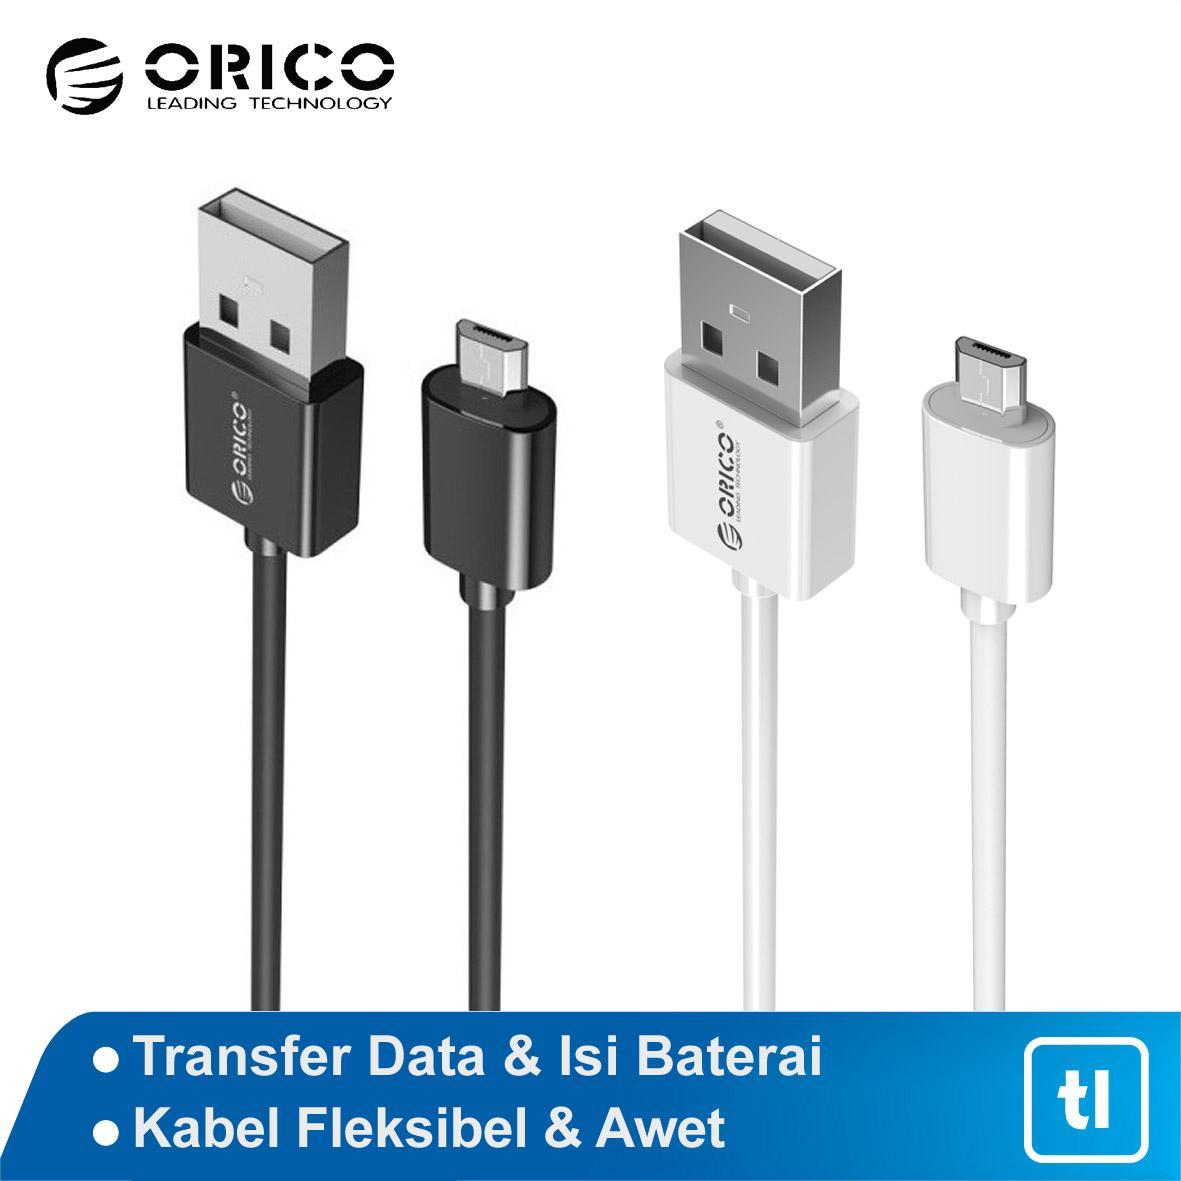 Kabel Harga Terupdate 1 Jam Lalu Orico Hm14 10 Gold Plated Connectors Hdmi Hdtv Cable Data Micro Usb Adc Meter Garansi Resmi